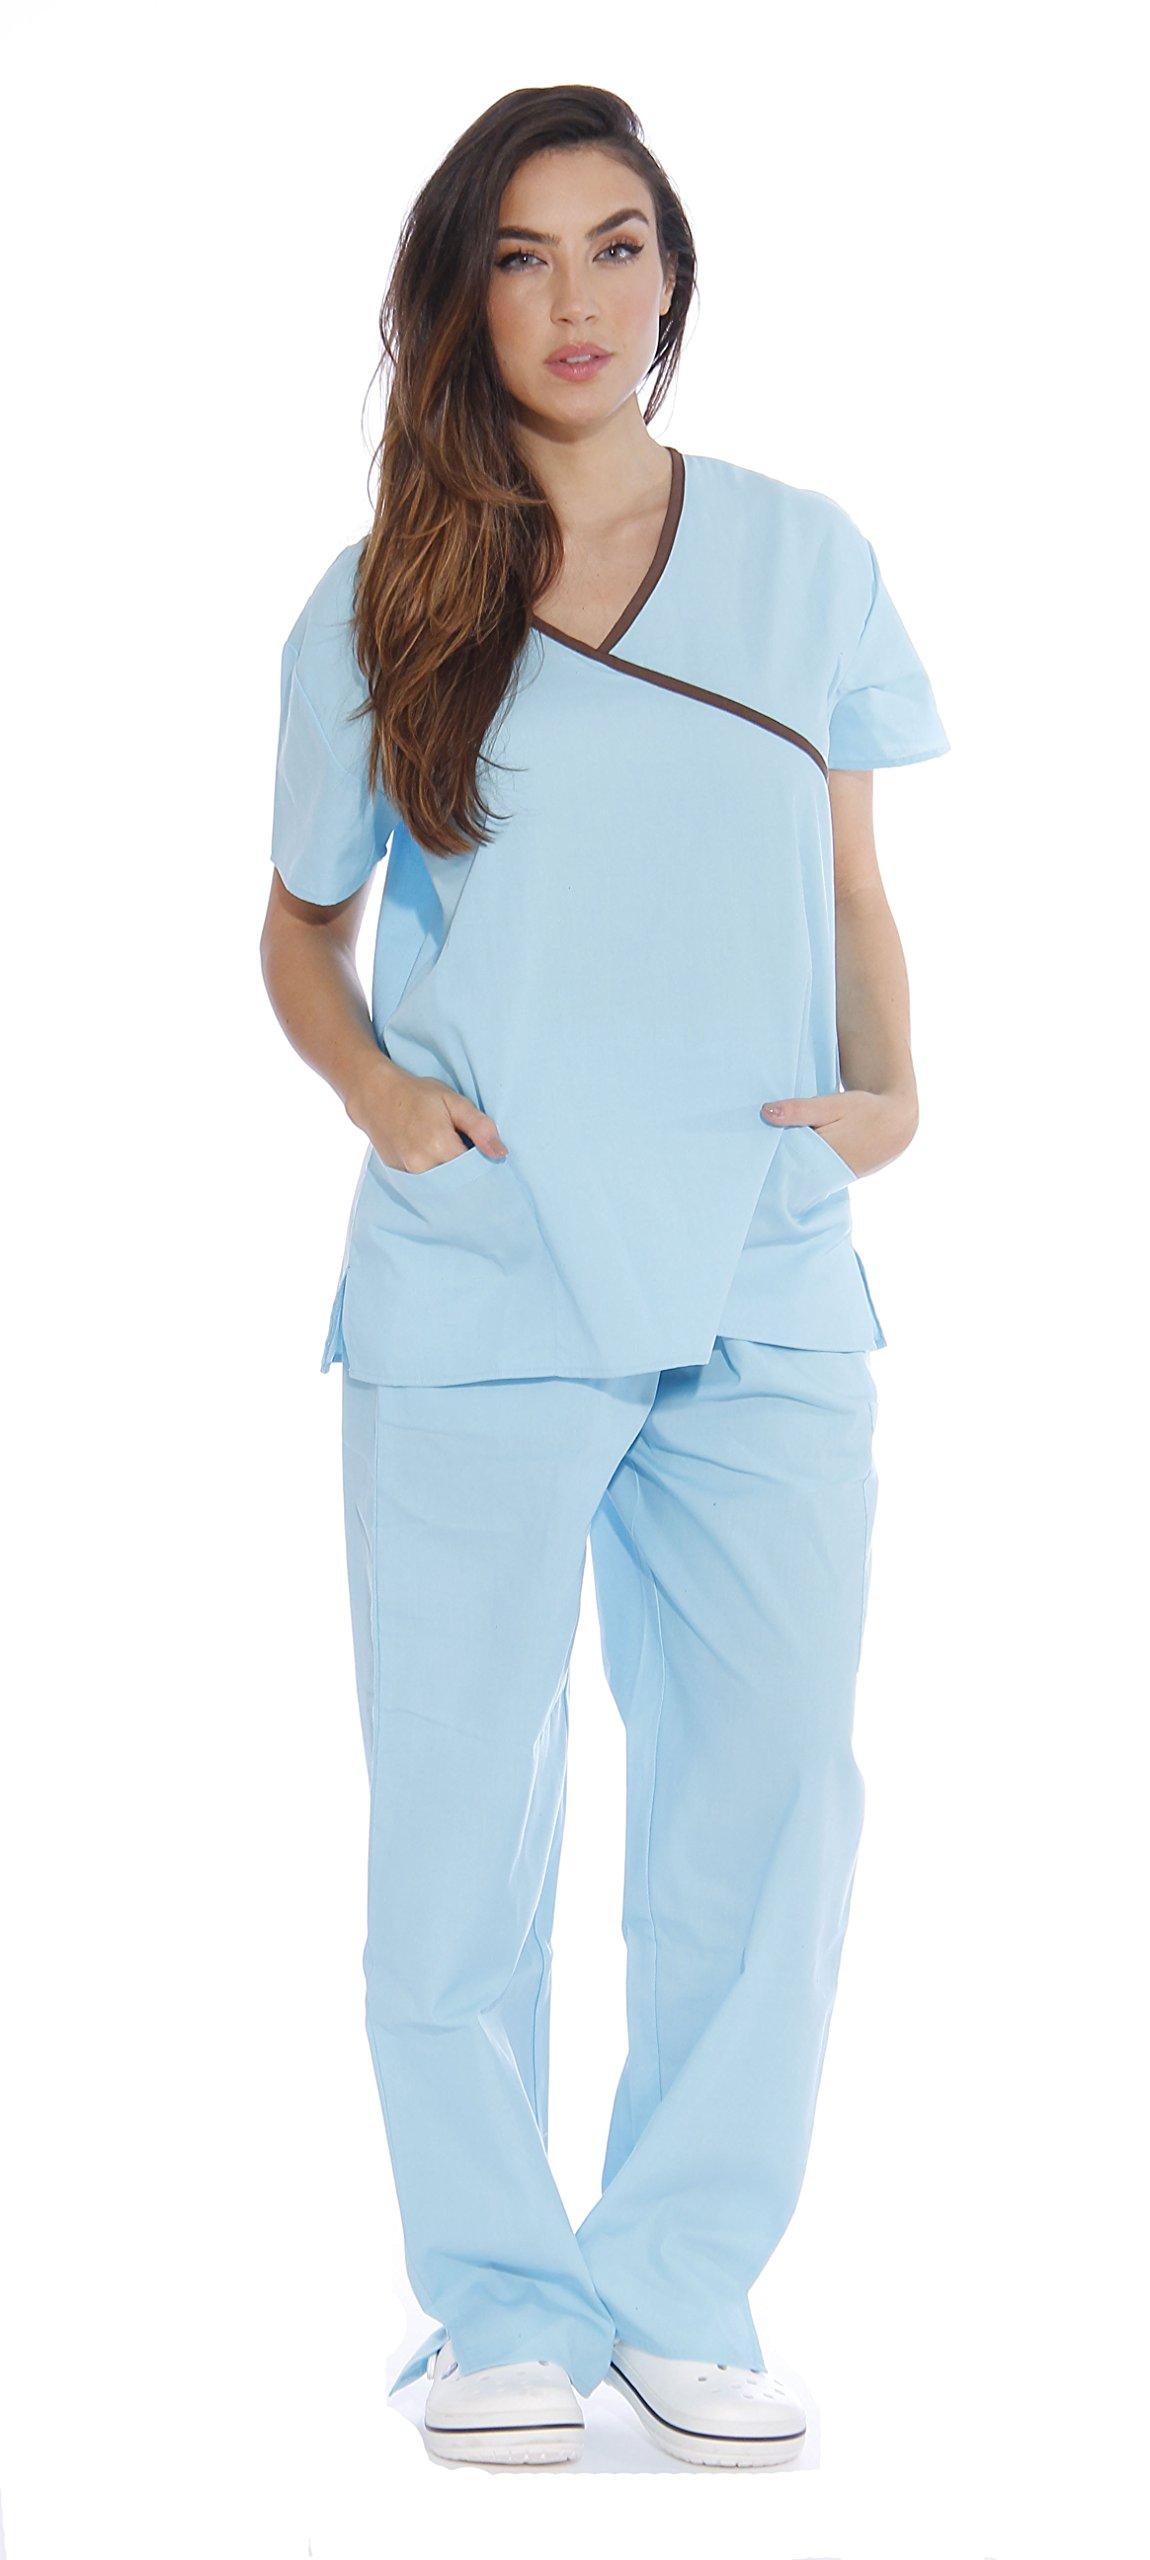 11149W Just Love Women's Scrub Sets / Medical Scrubs / Nursing Scrubs - XS, Aqua with Chocolate Trim,Aqua With Chocolate Trim,X-Small